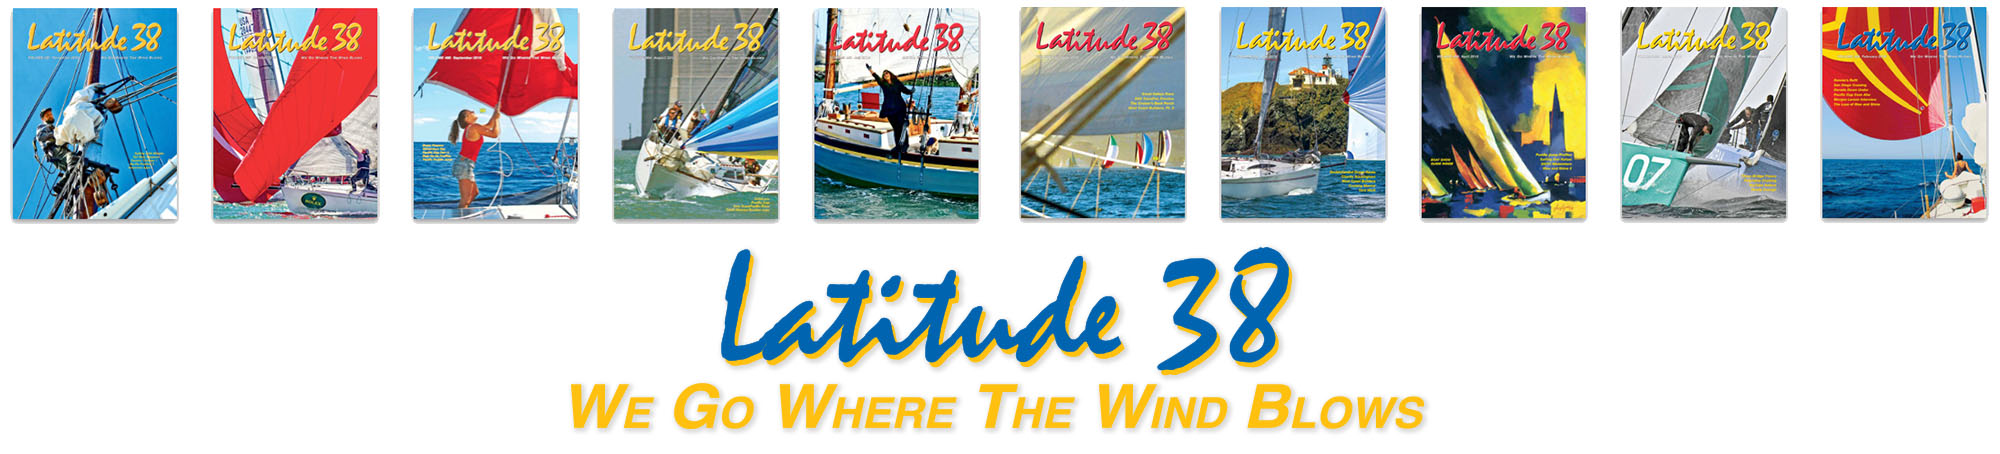 latitude-38-banner-2018-b.jpg